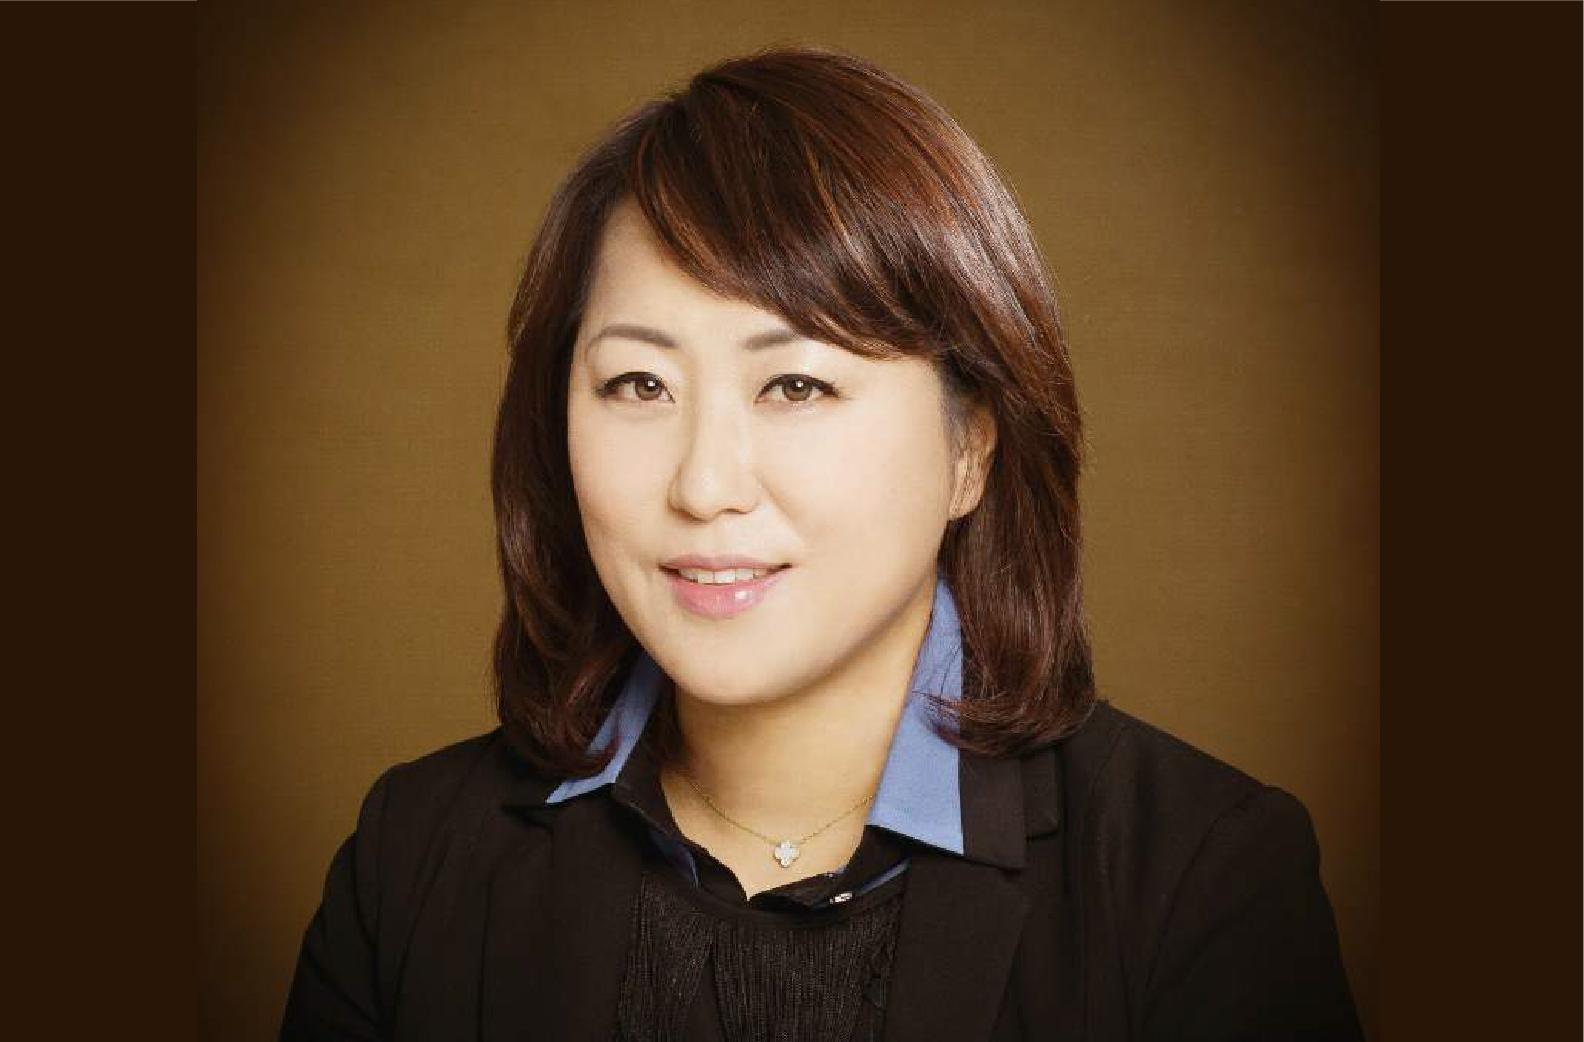 SUN YU Financial Professional & Insurance Agent